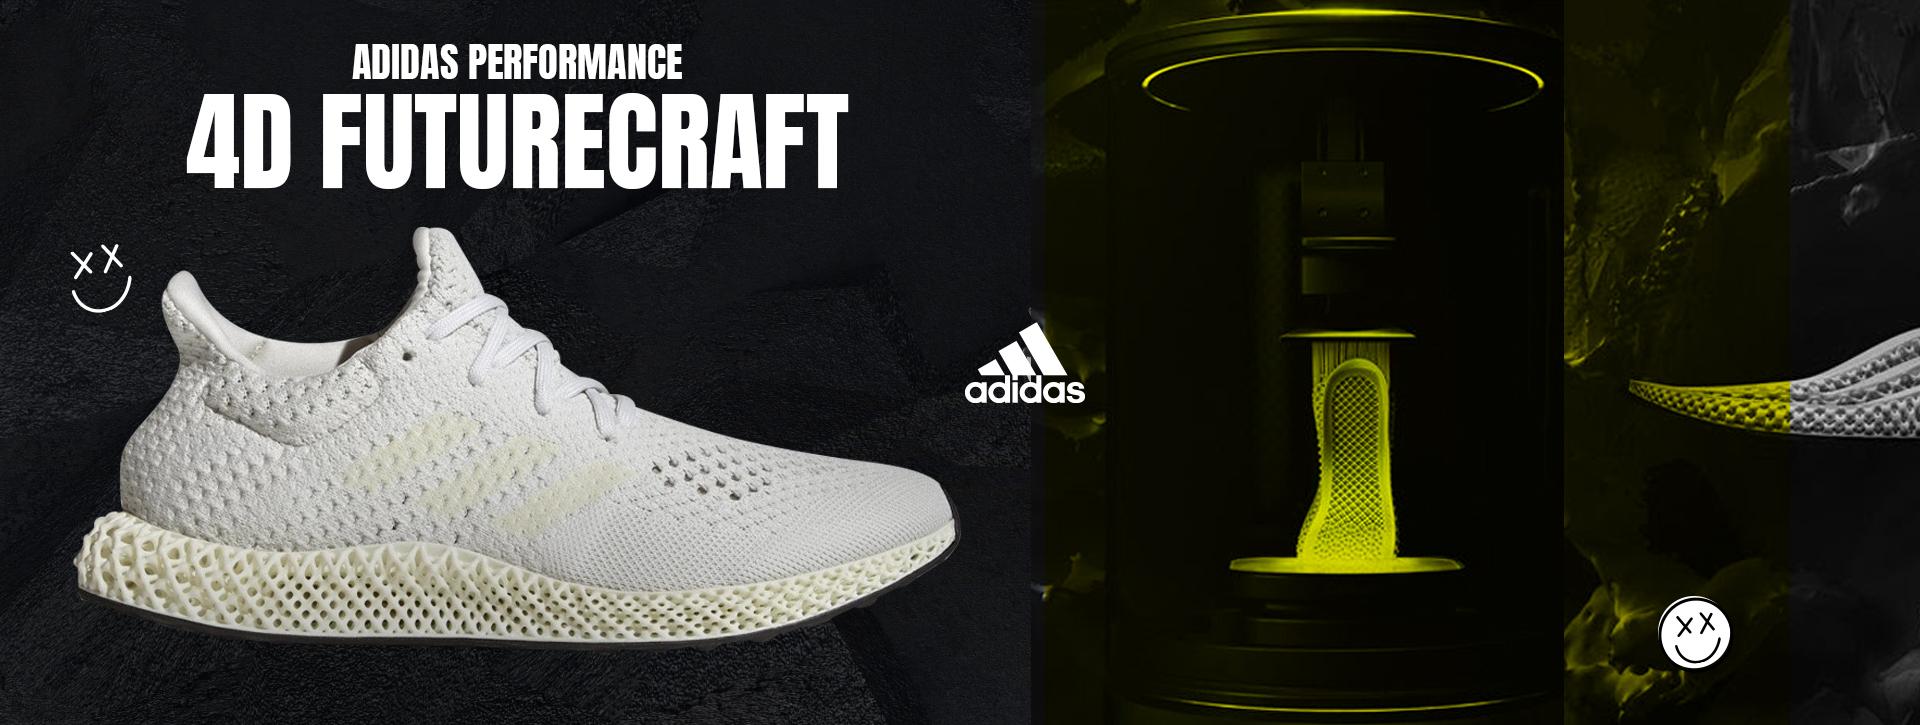 adidas Performance 4D Futurecraft